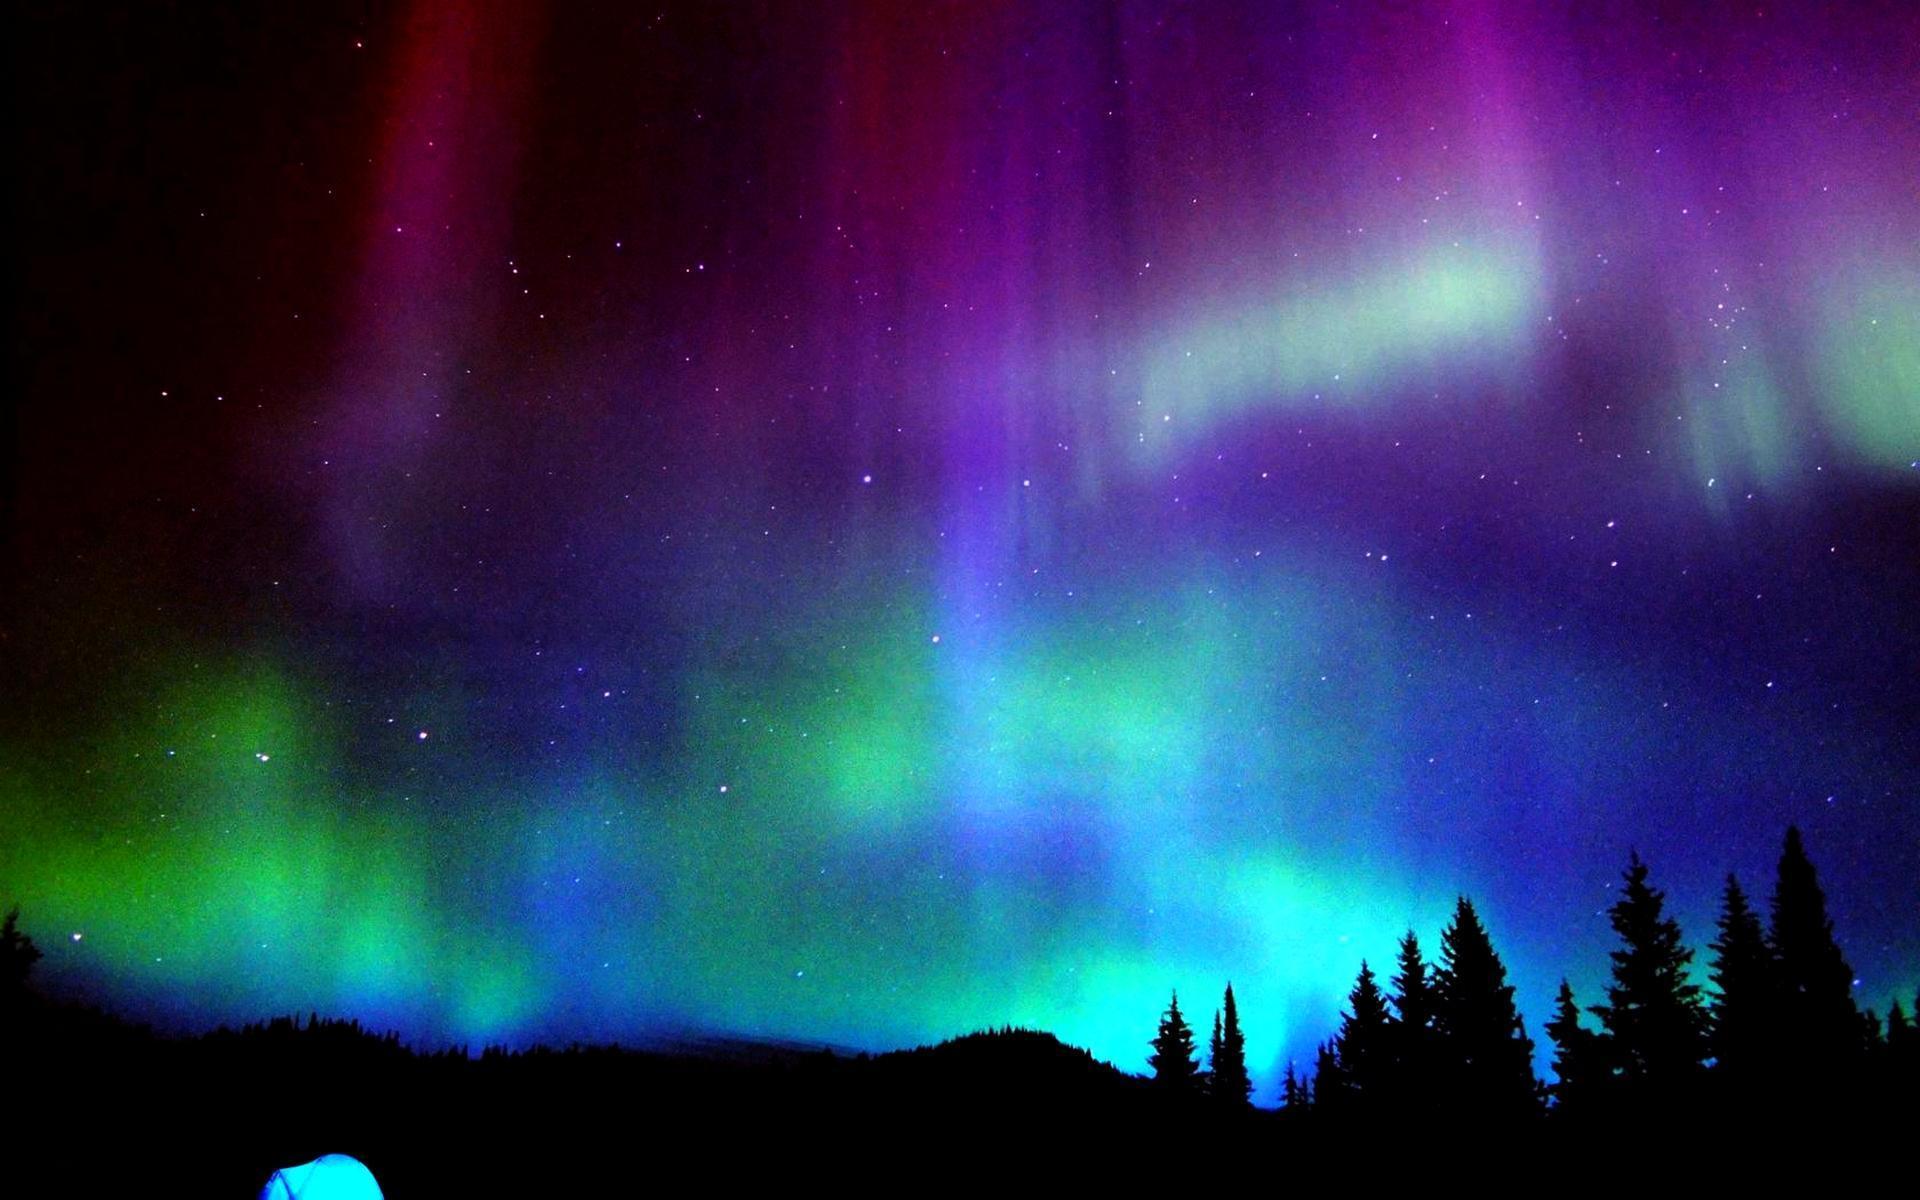 aurora borealis nature - photo #26